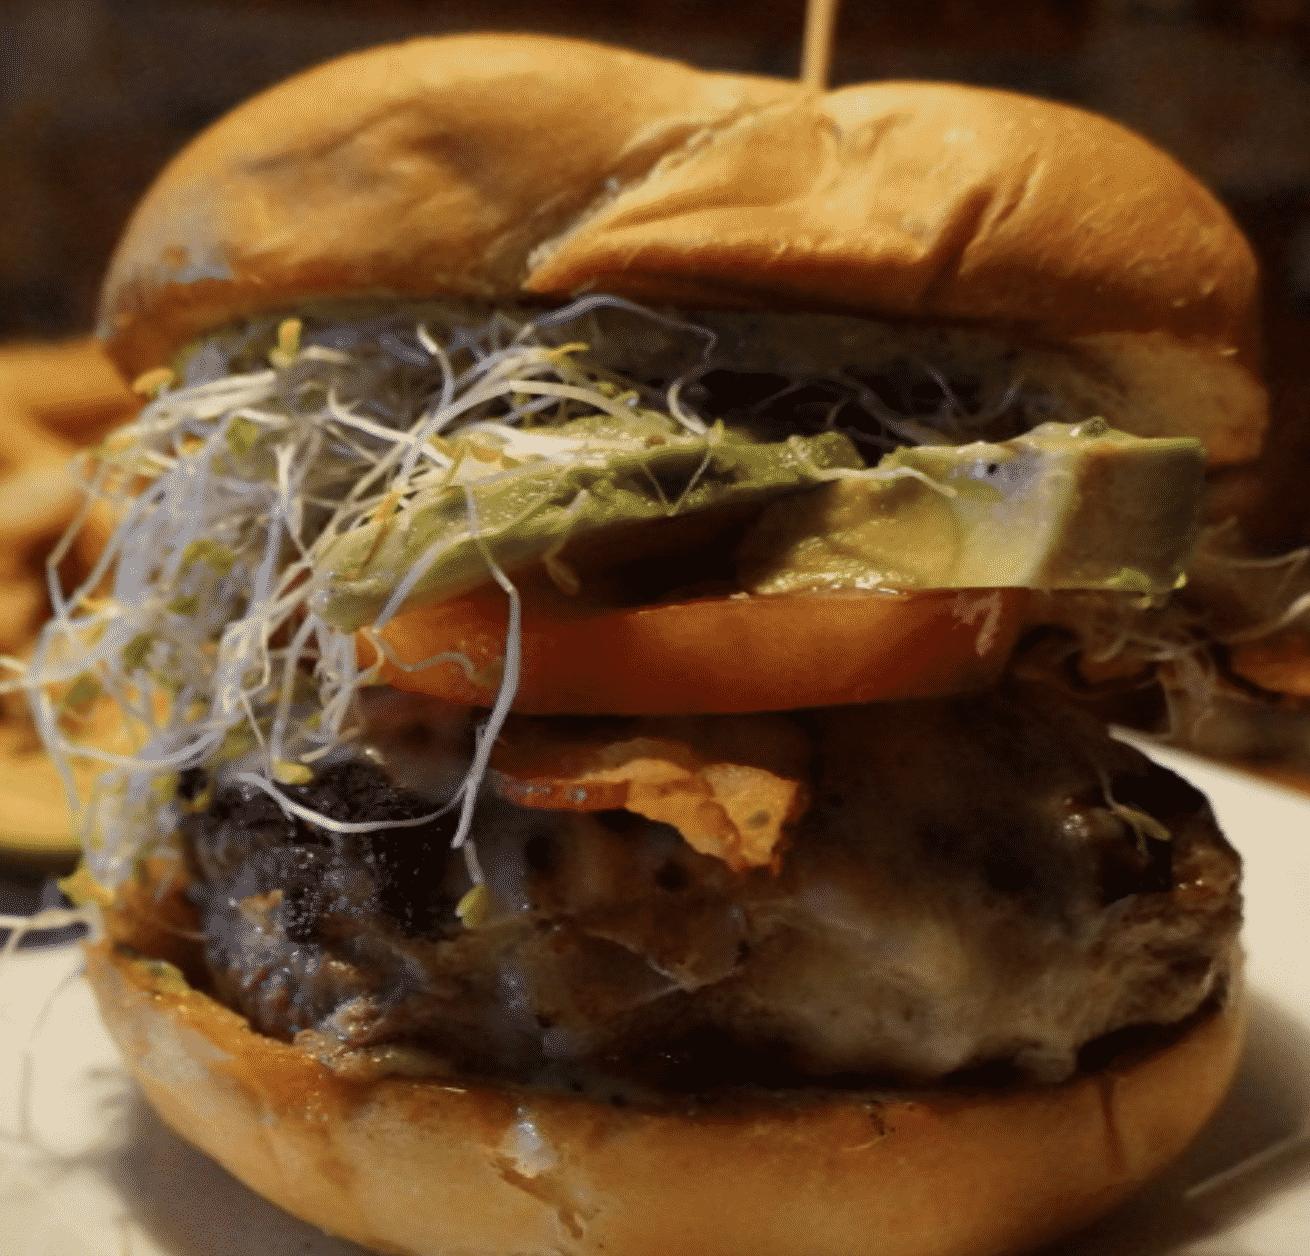 The Fork 'N' Cork Burger North Carolina Burgers